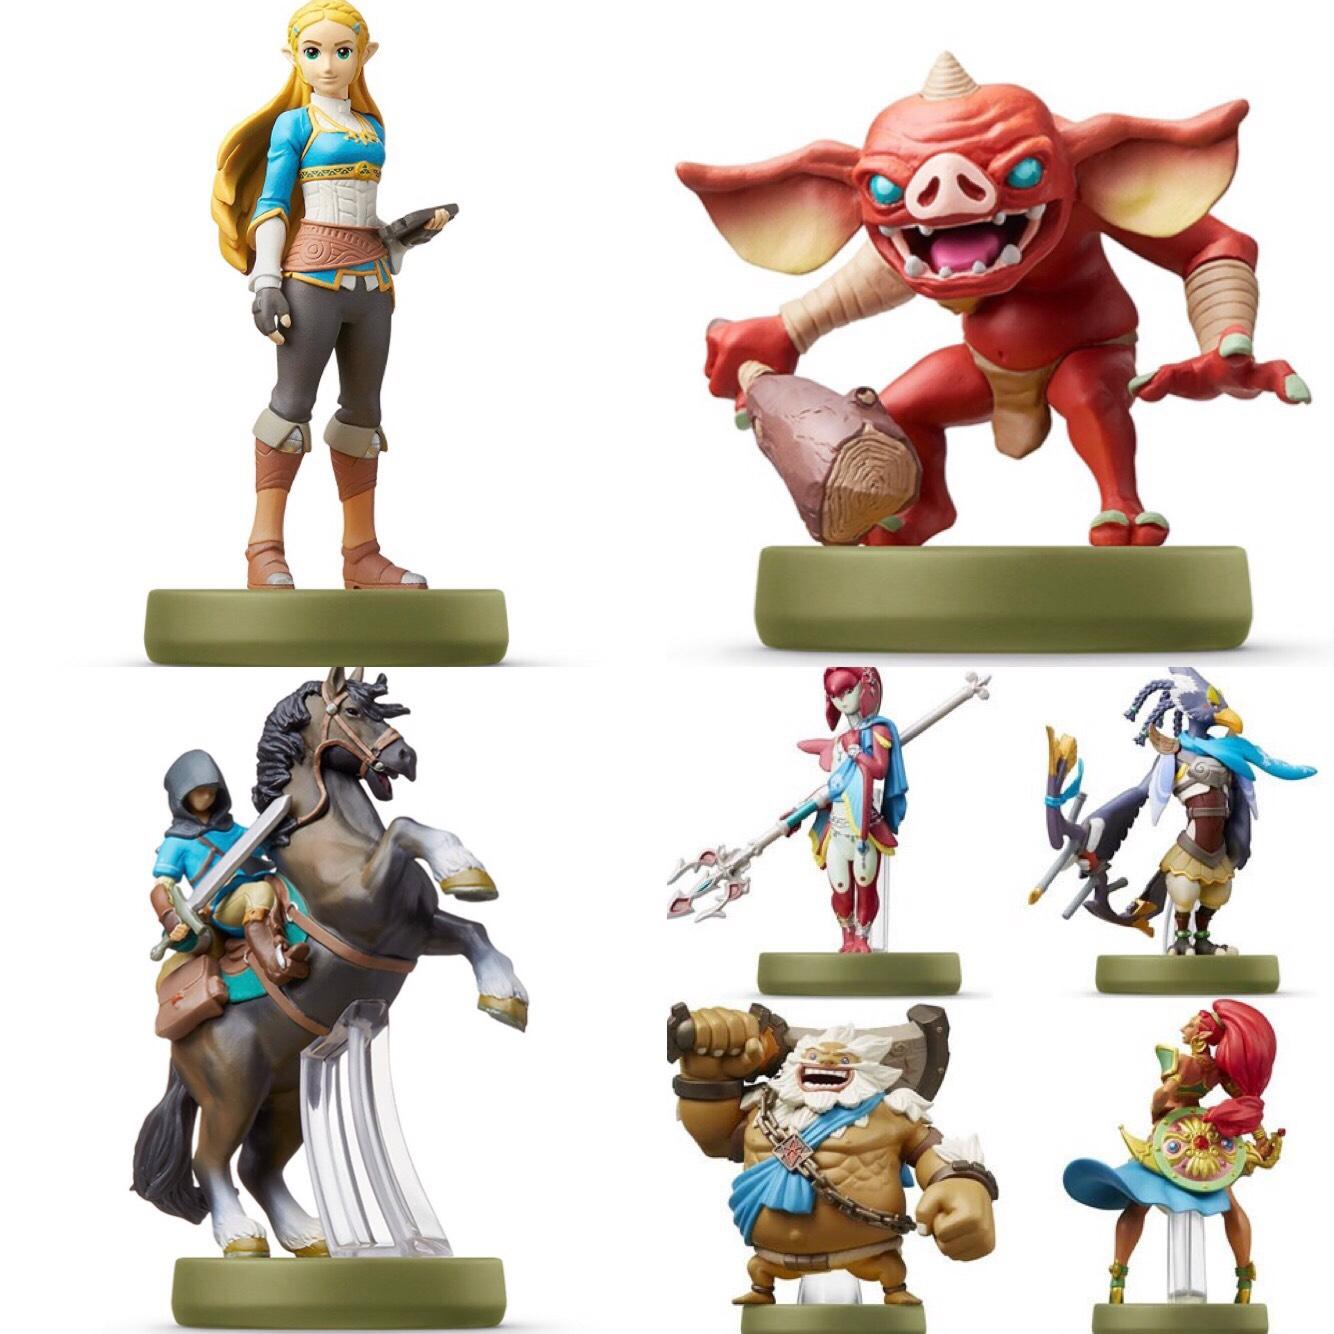 Various Zelda BOTW Amiibo @ Amazon from £12.99 (Non Prime add £1.99 P&P unless spending £20+)